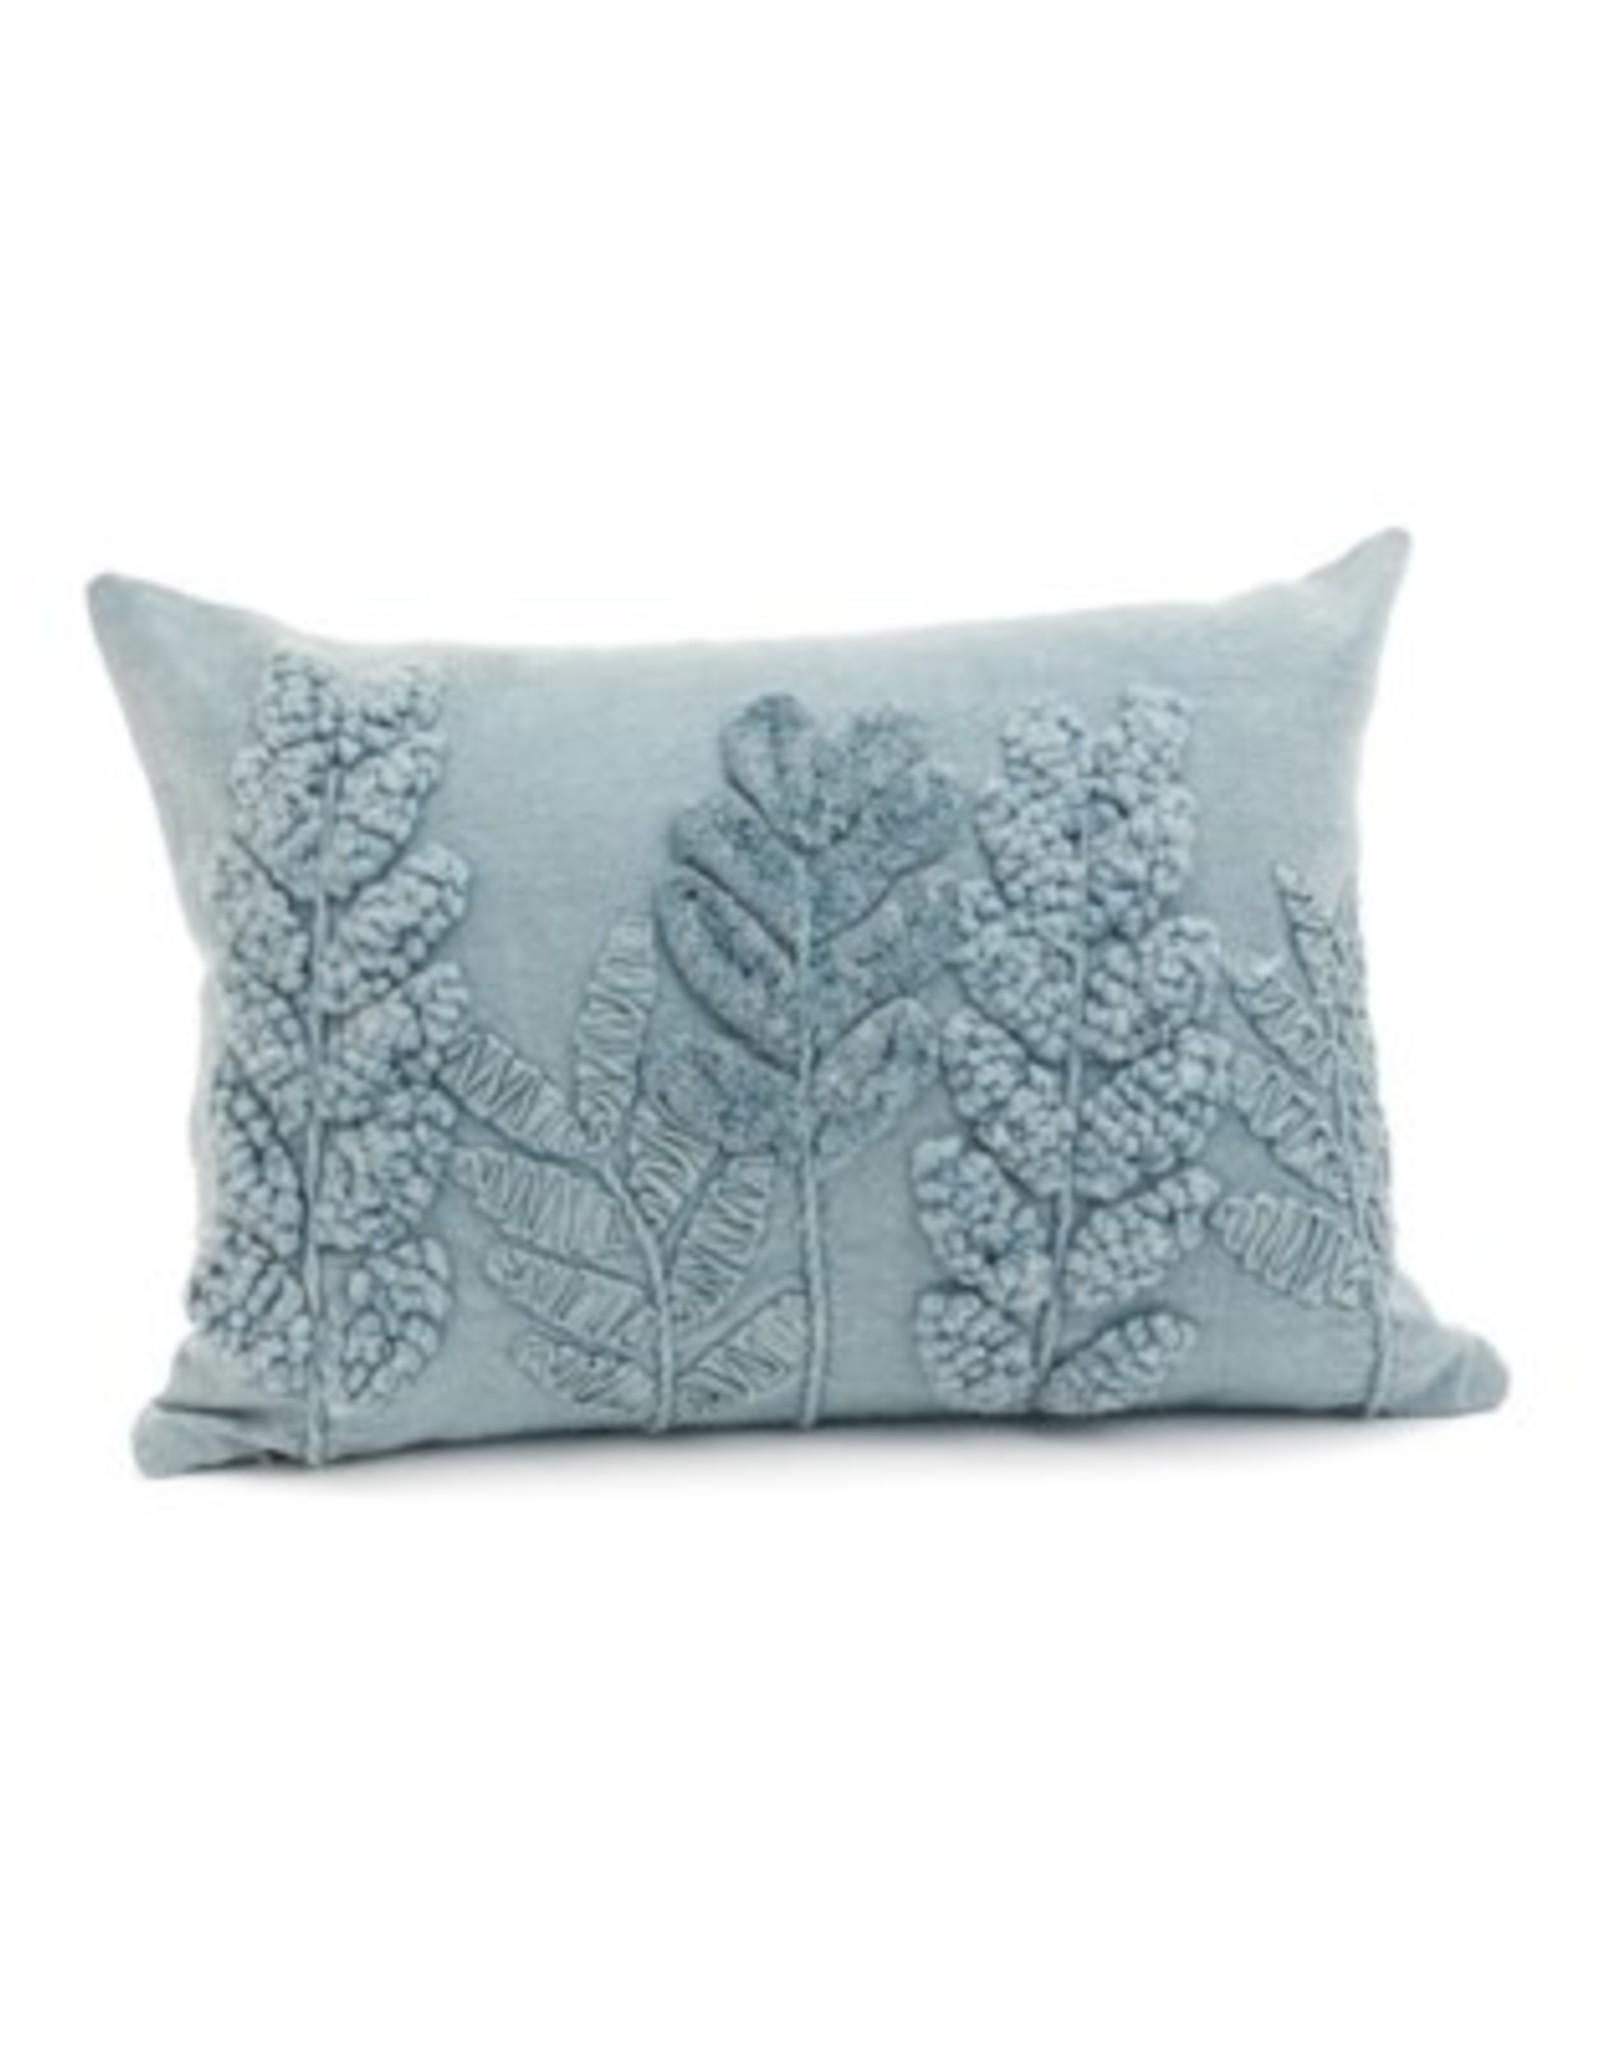 Cushions PC Acid Wash Light Blue 14 x 20 8190603